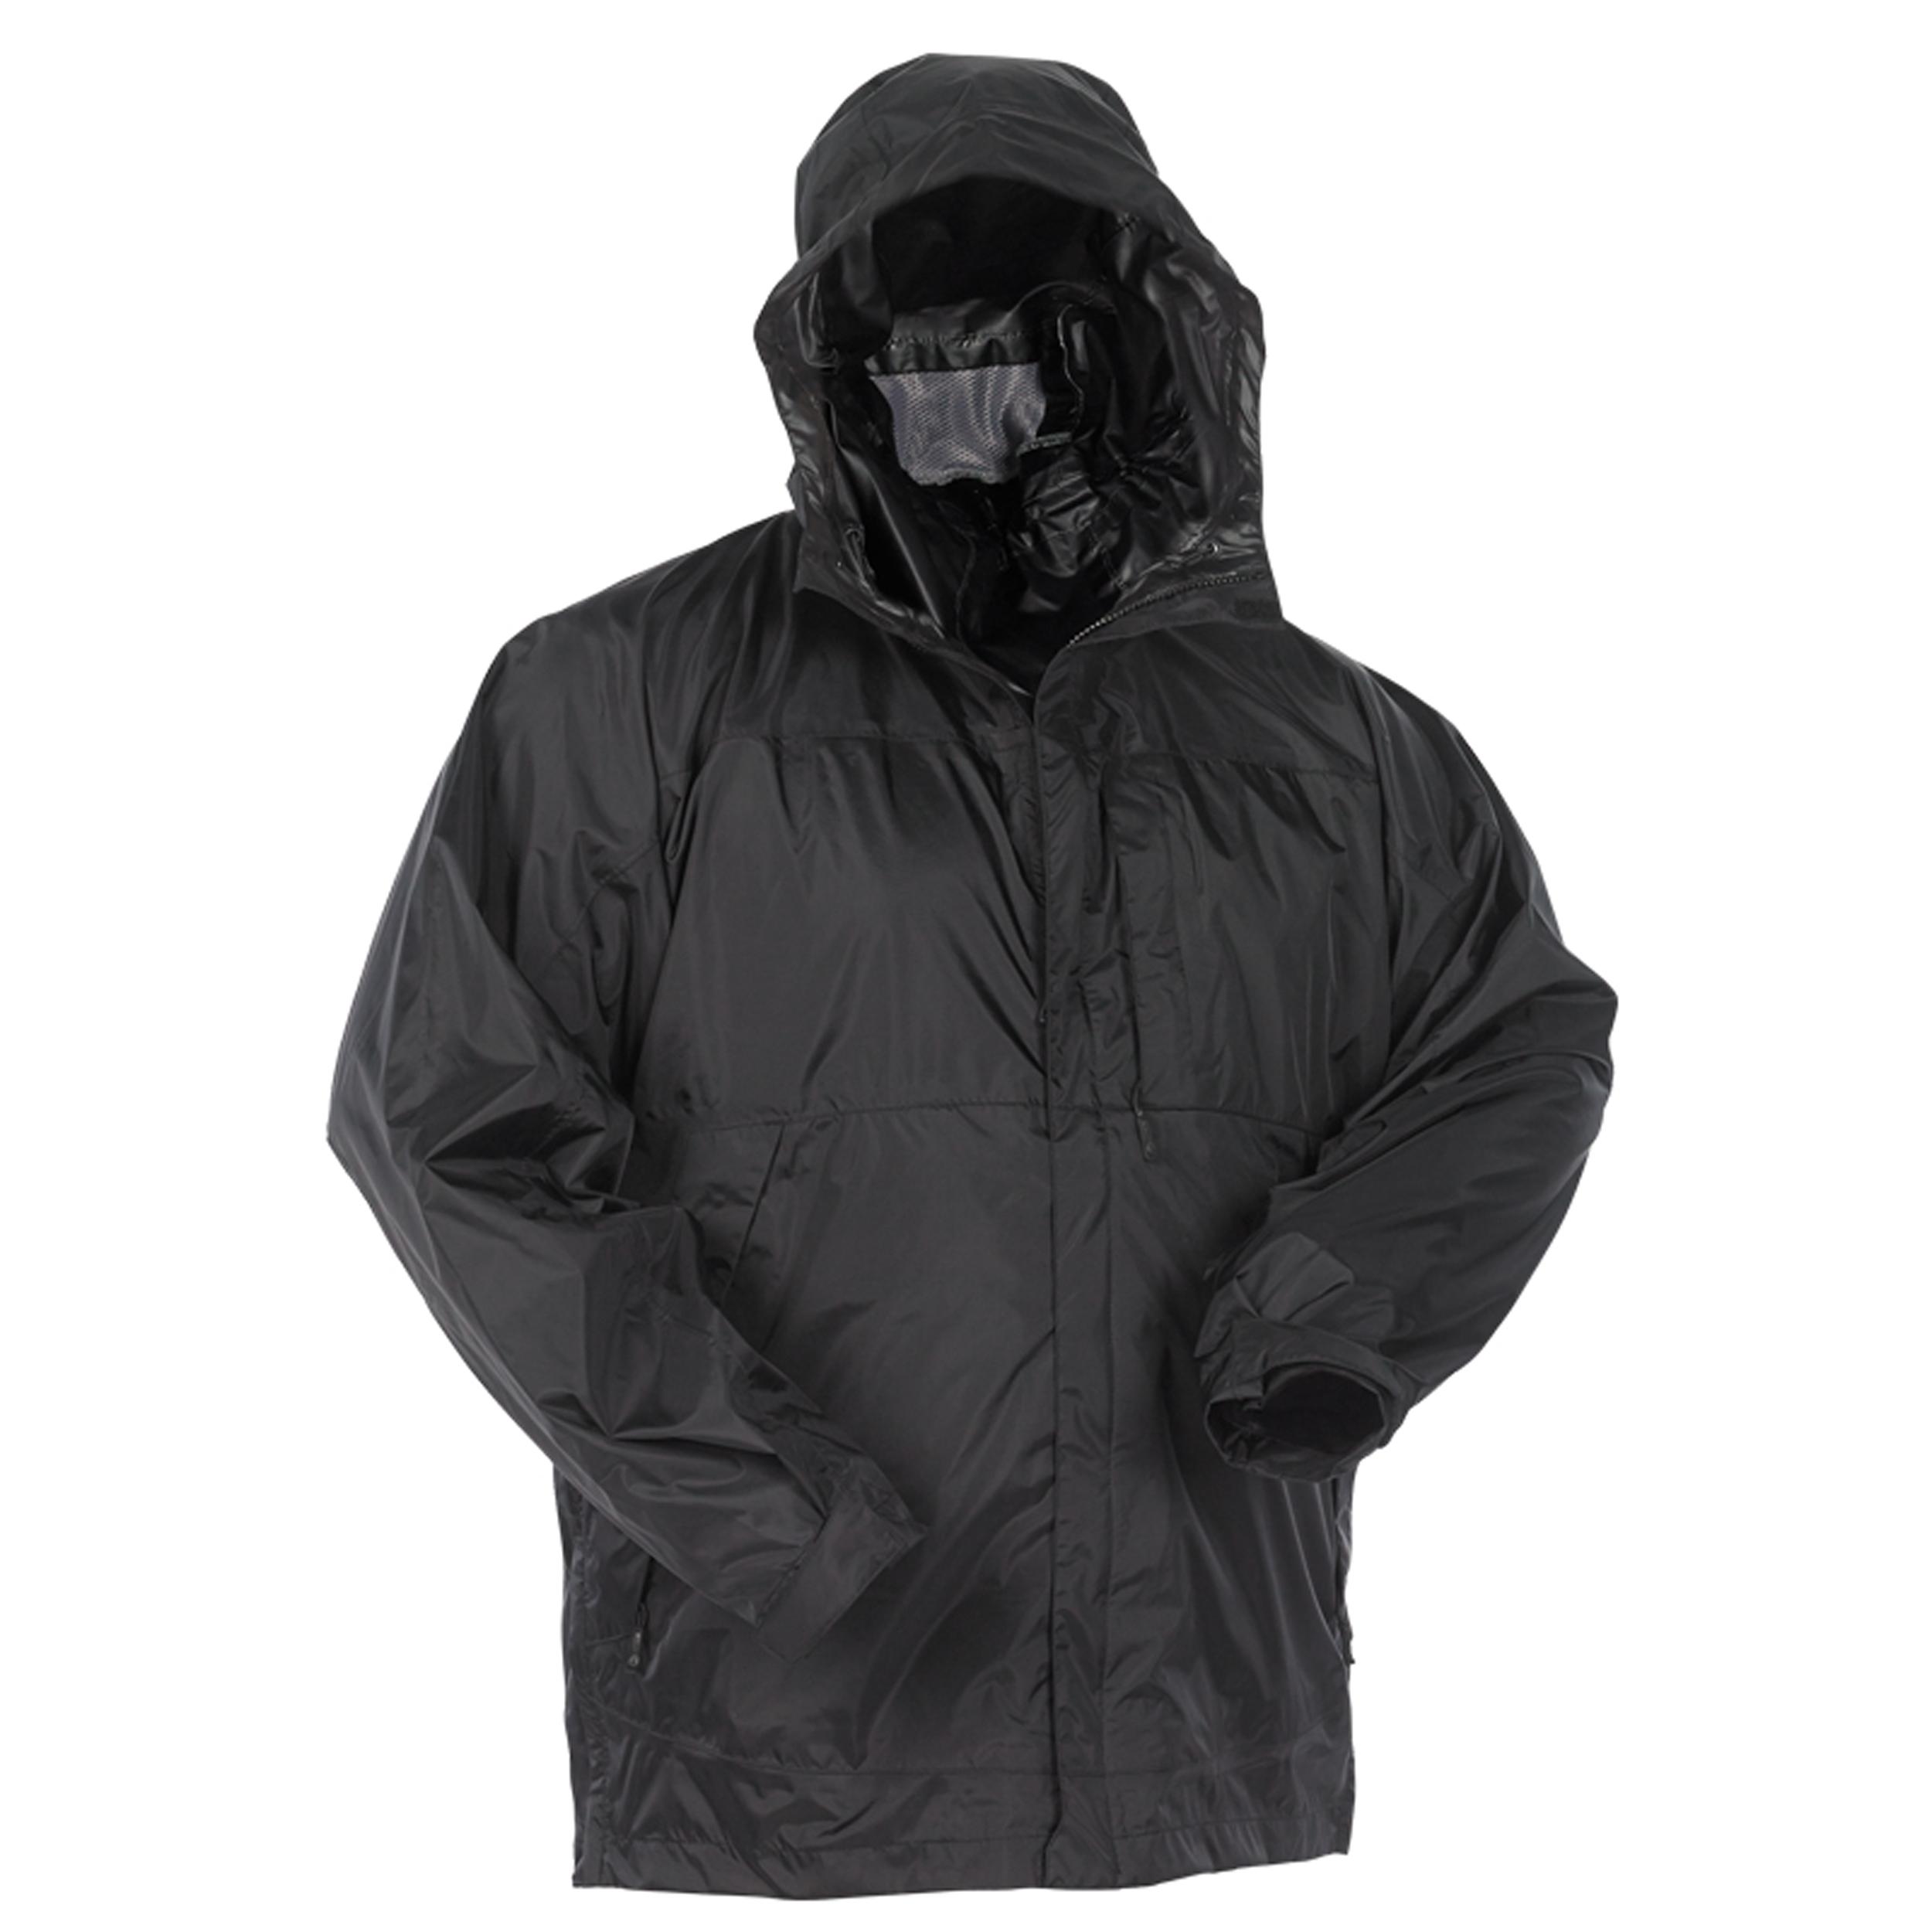 Snugpak Rj1 Rain Jacket Black Sm